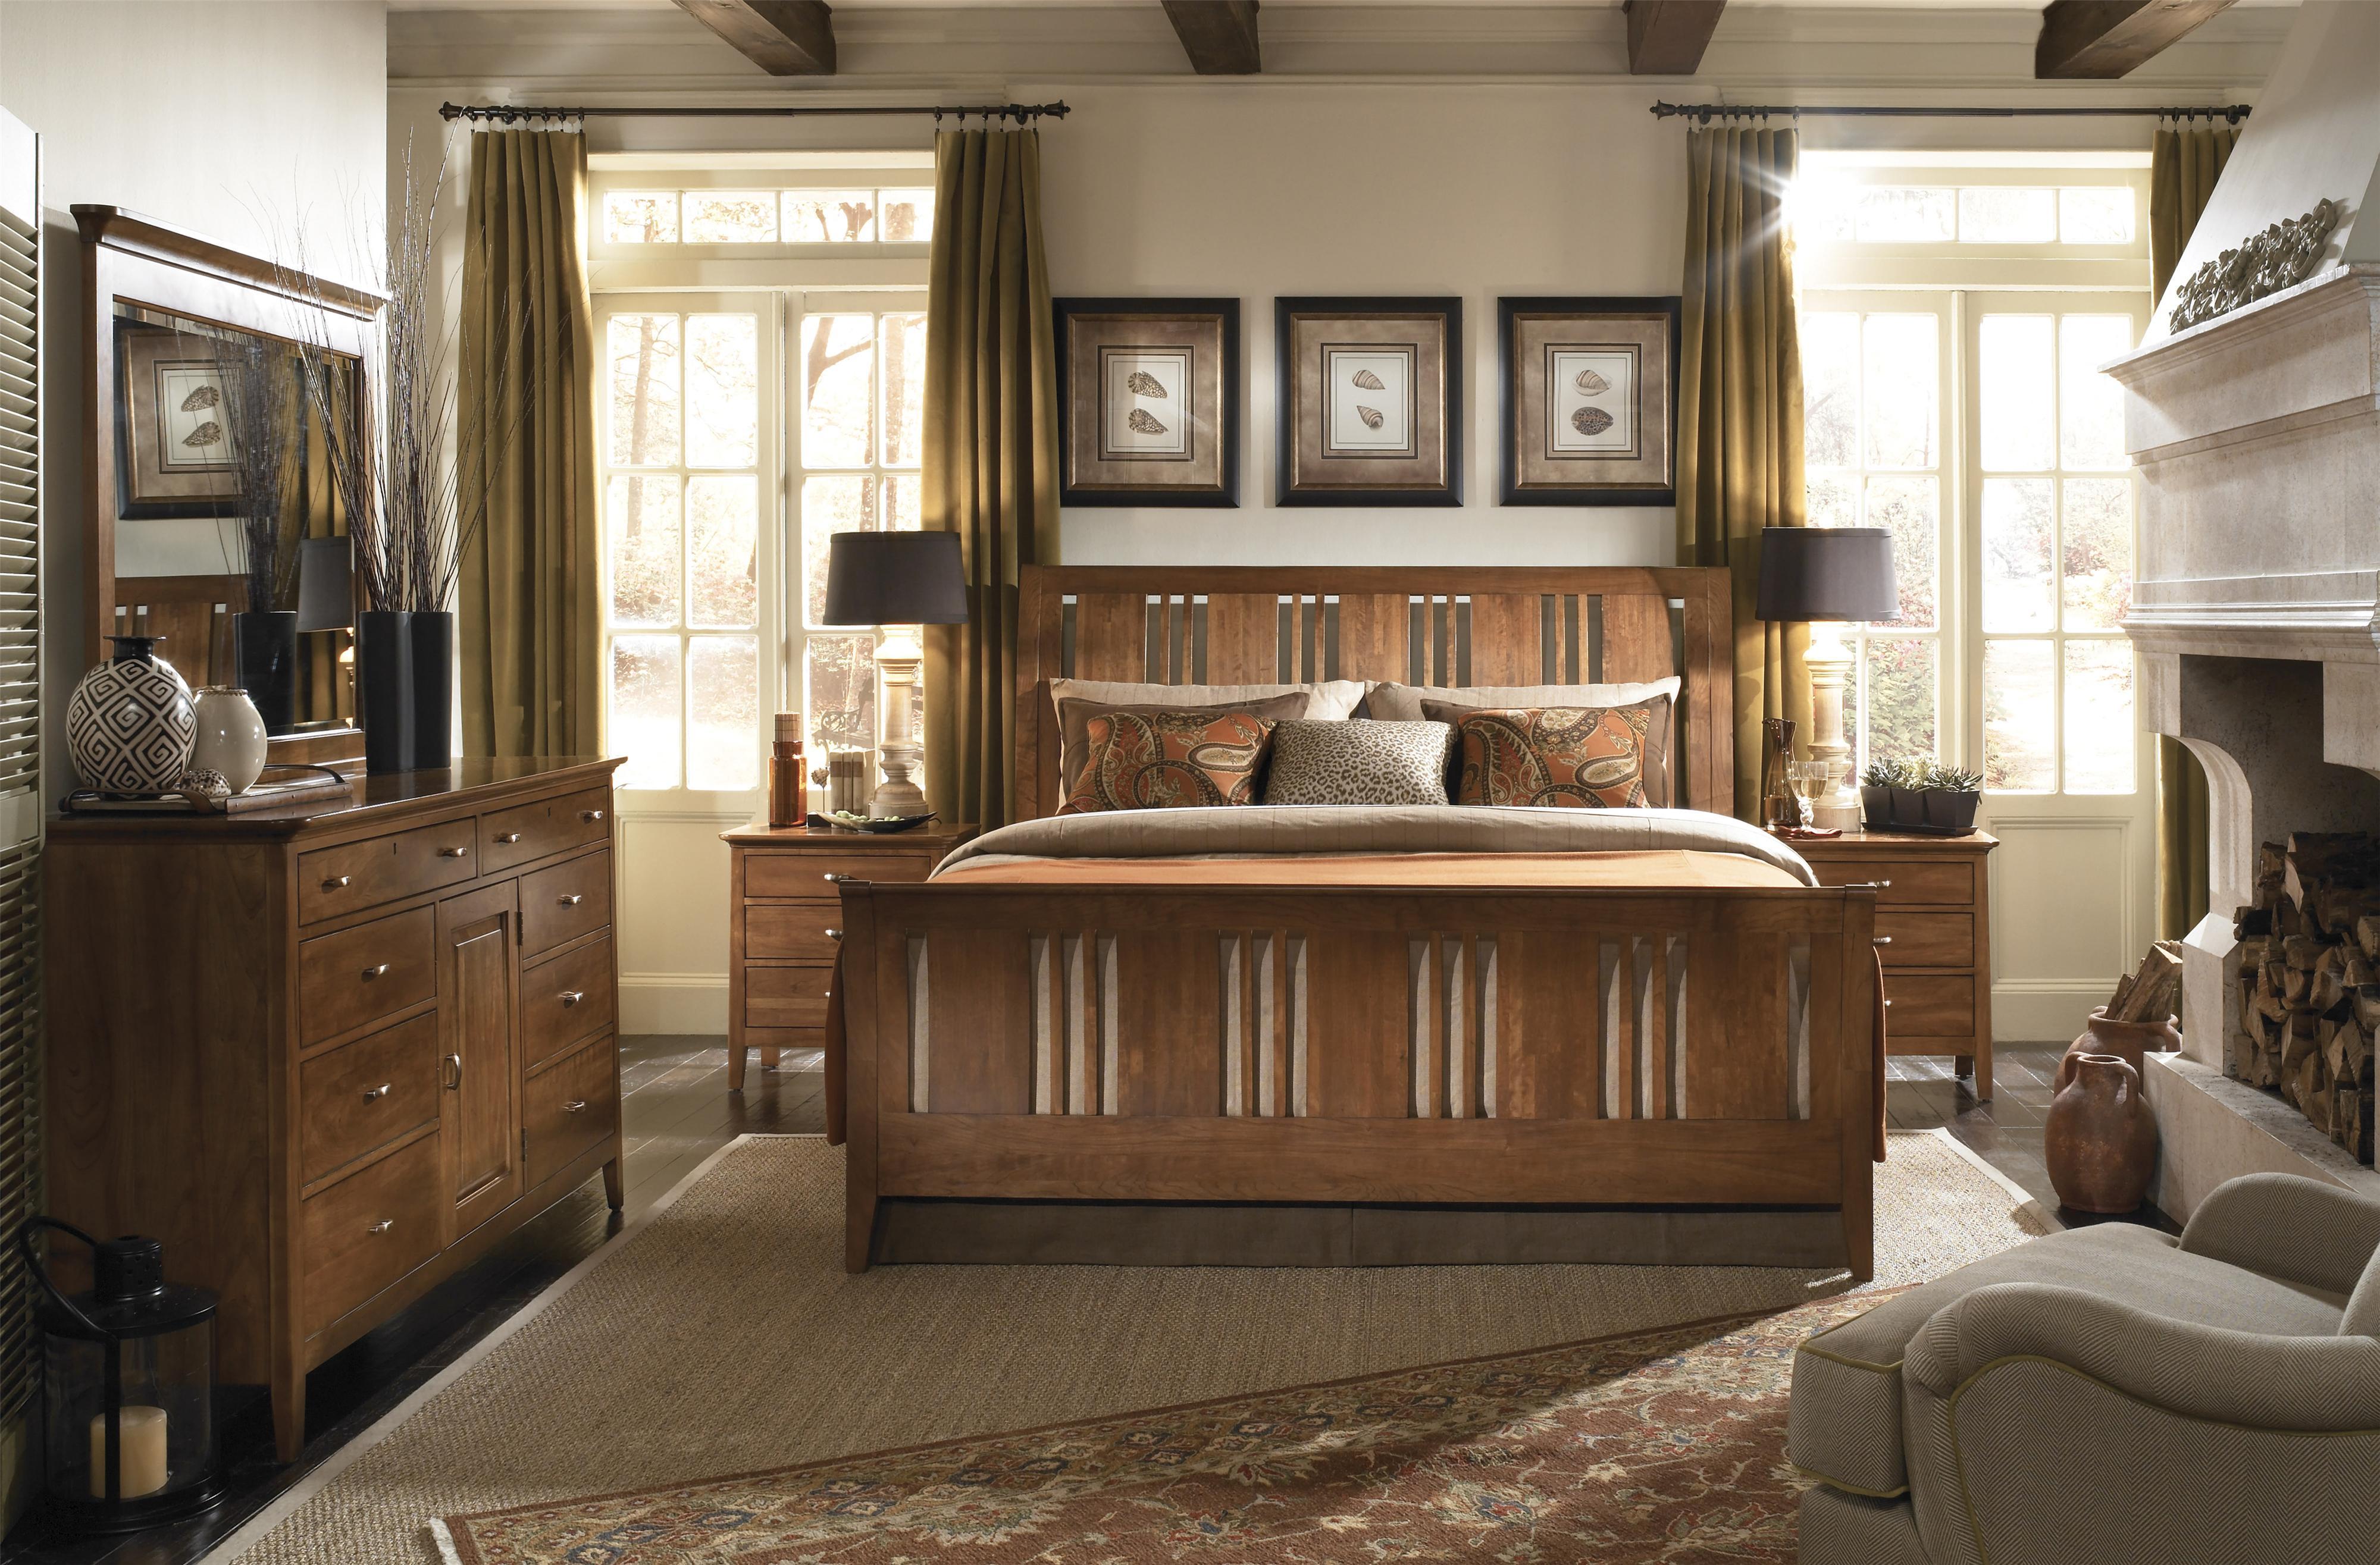 Kincaid Furniture Cherry Park e Drawer Open Nightstand